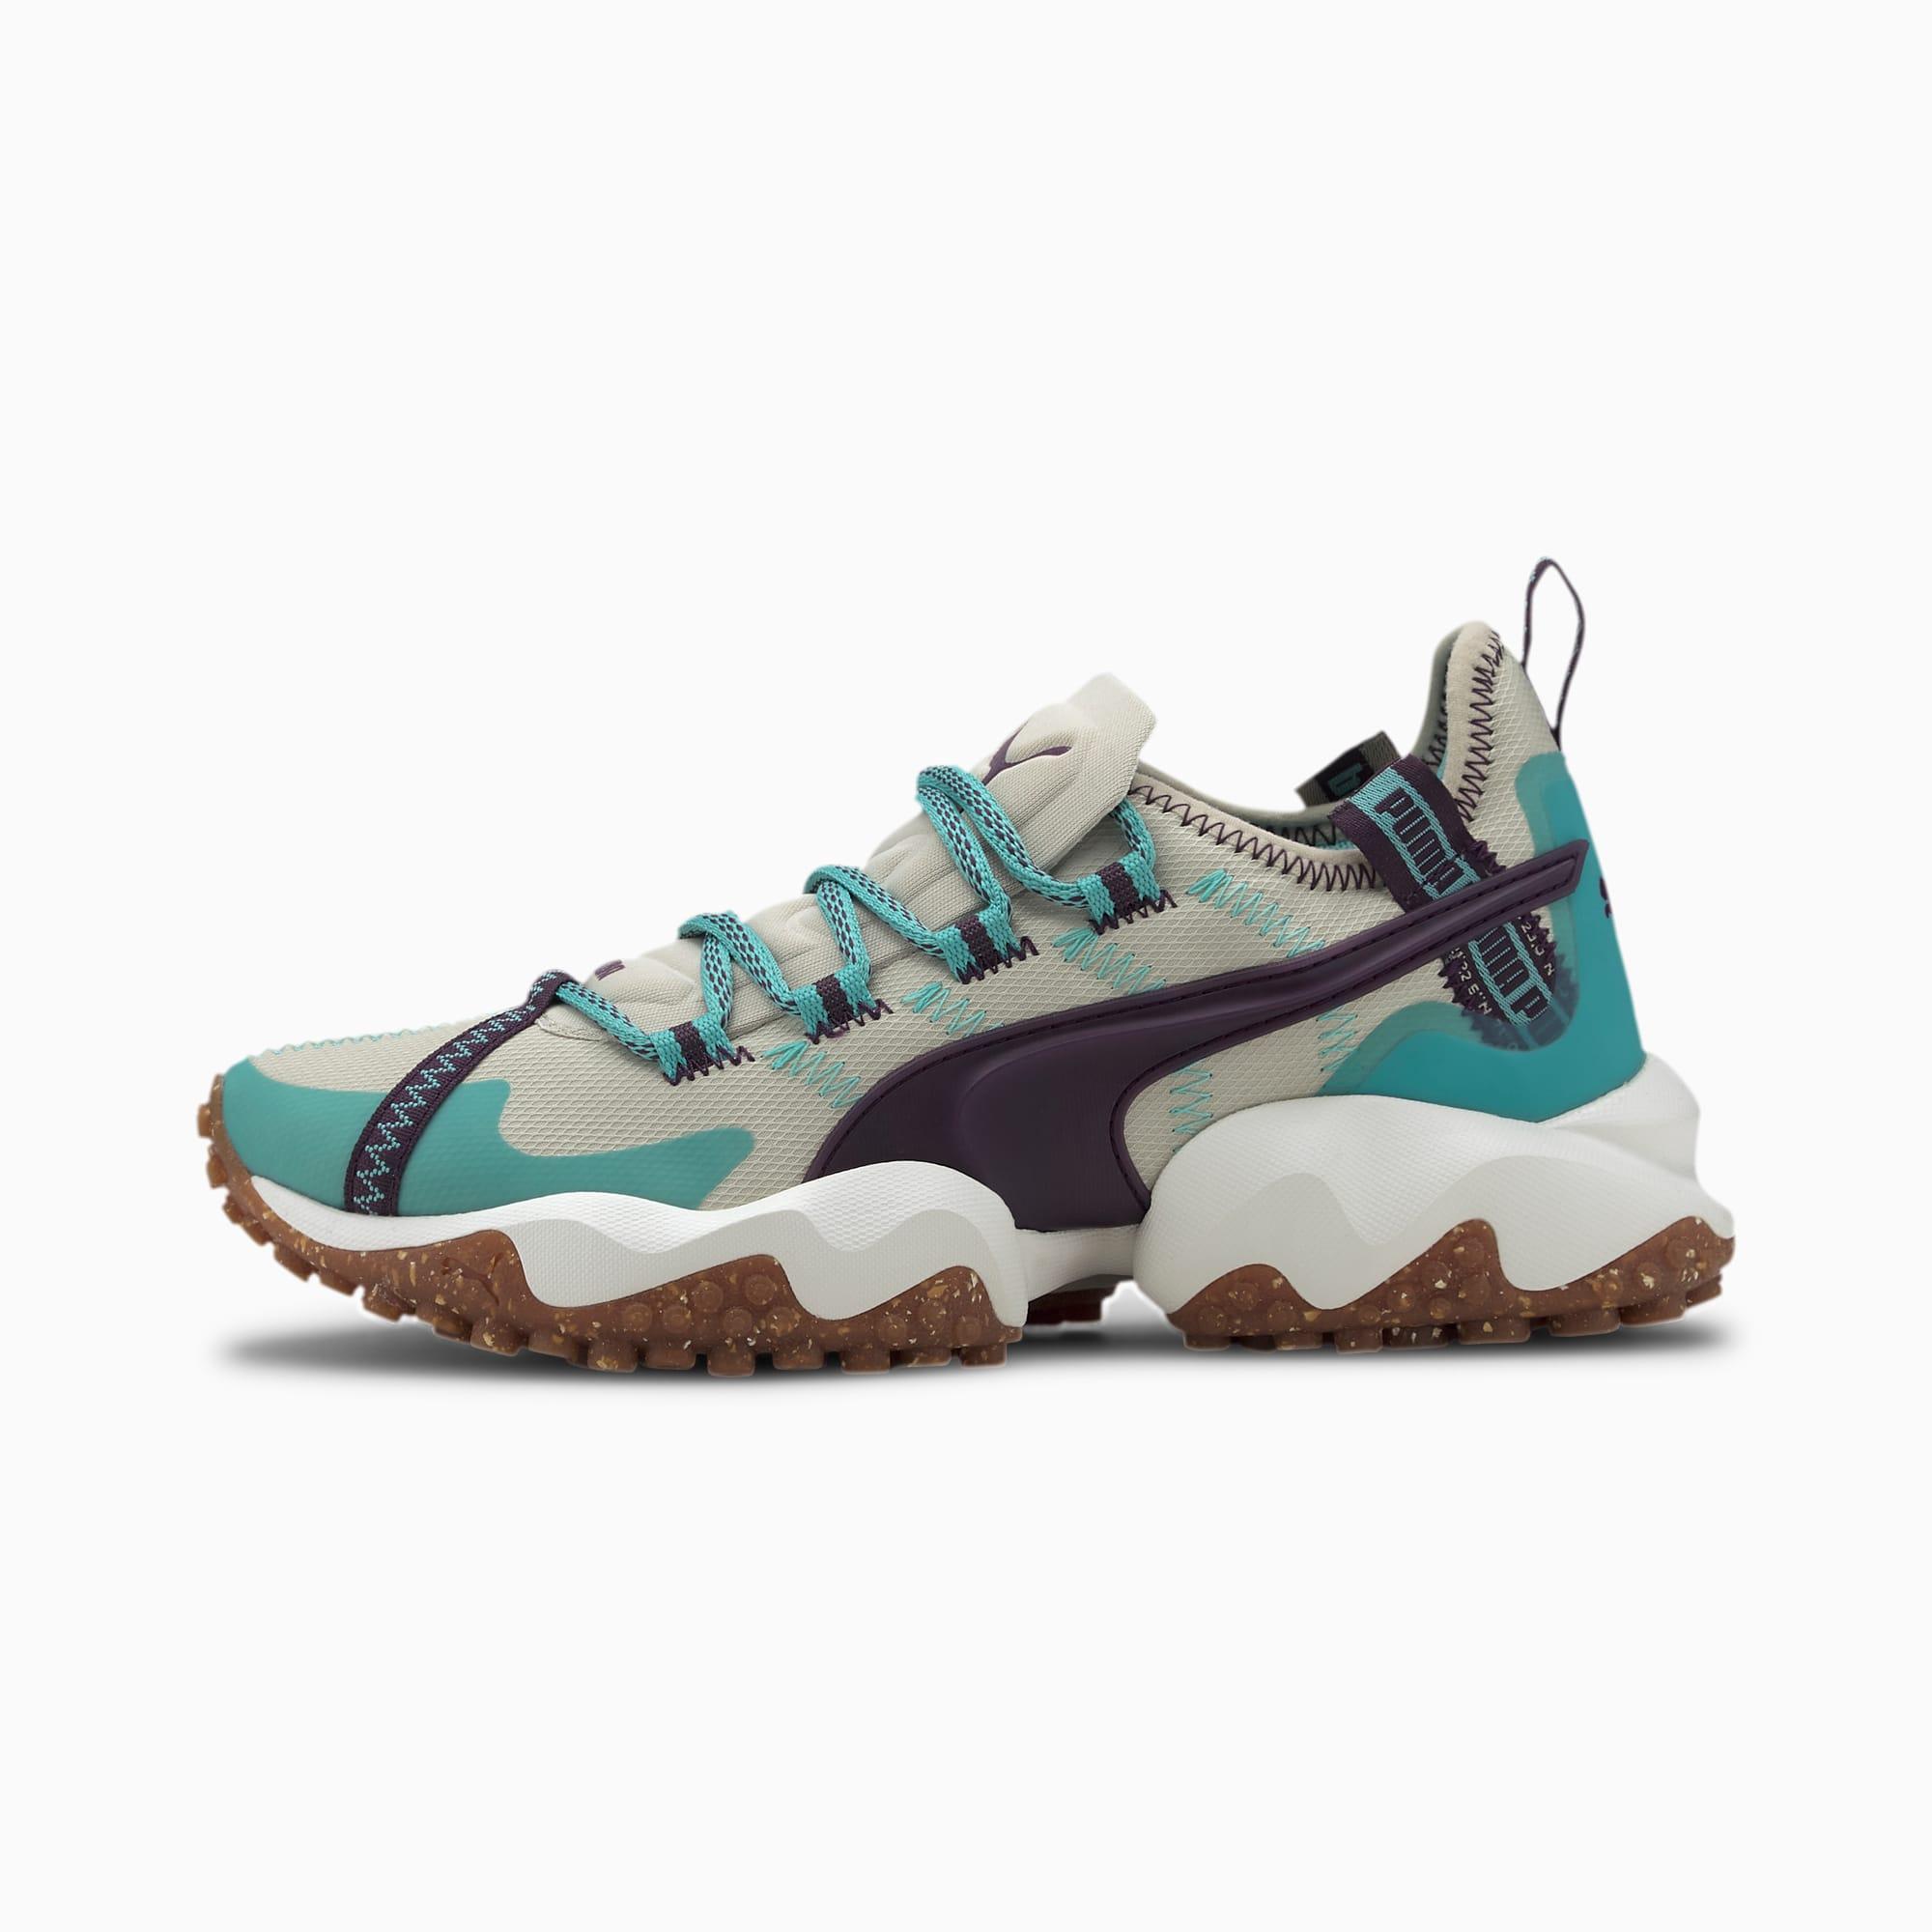 Erupt Women's Trail Running Shoes